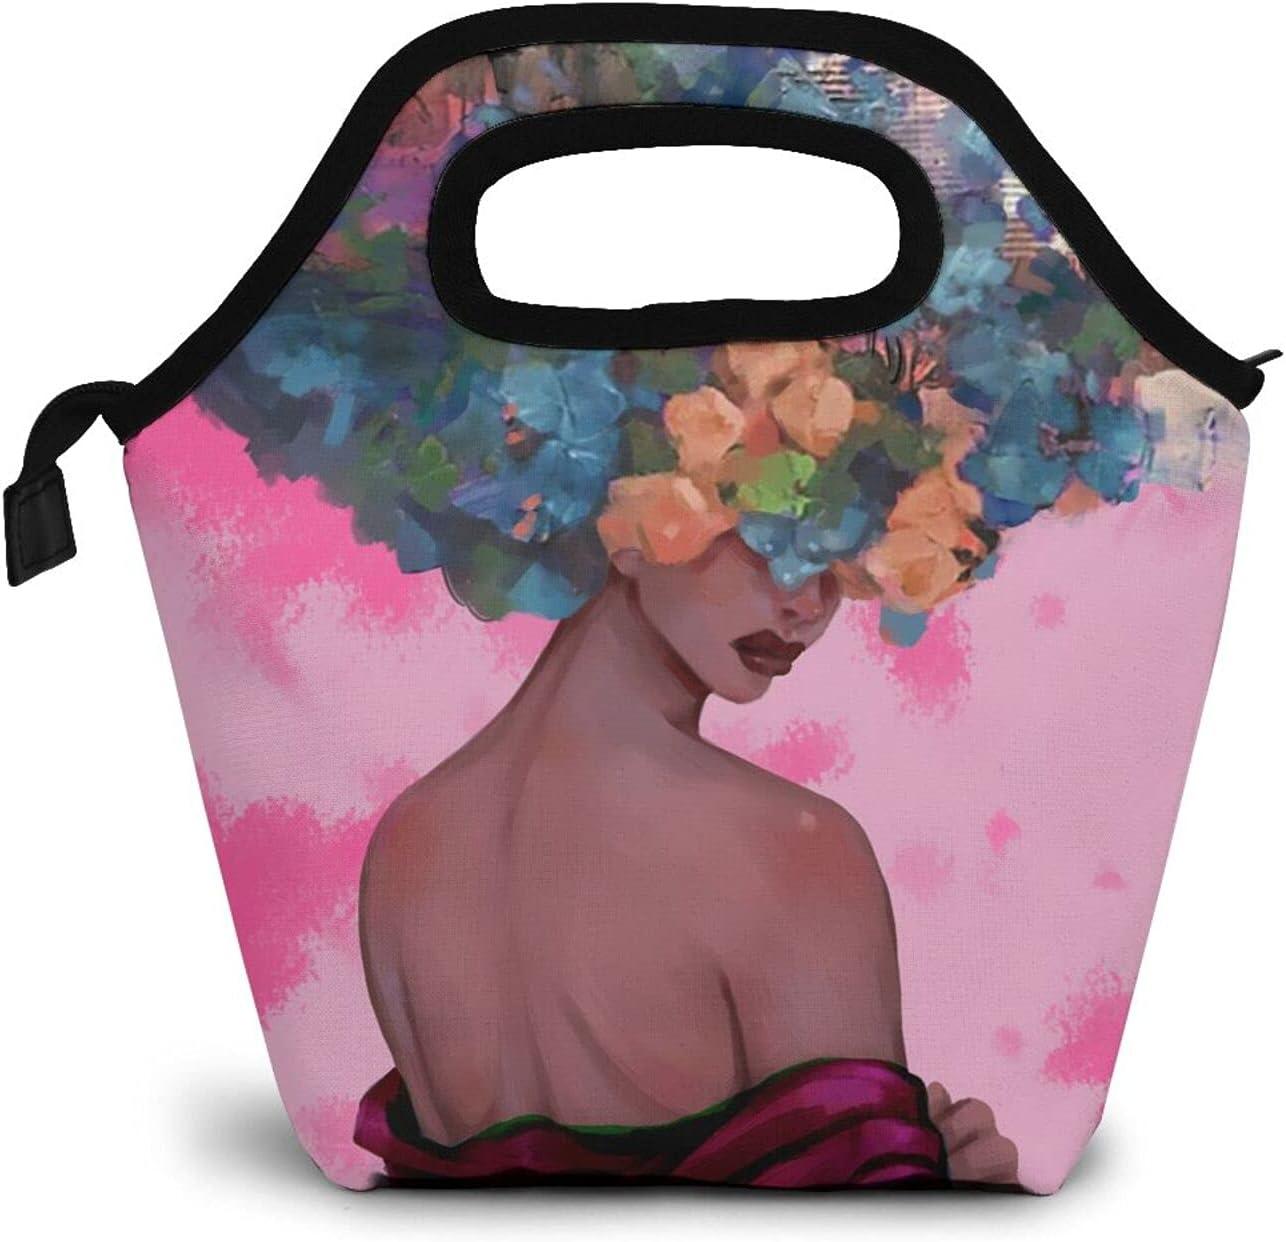 Black Woman Lunch Bag Afro Black Woman Handbag Lunch Kit for Woman School Travel Reusable(Pink)